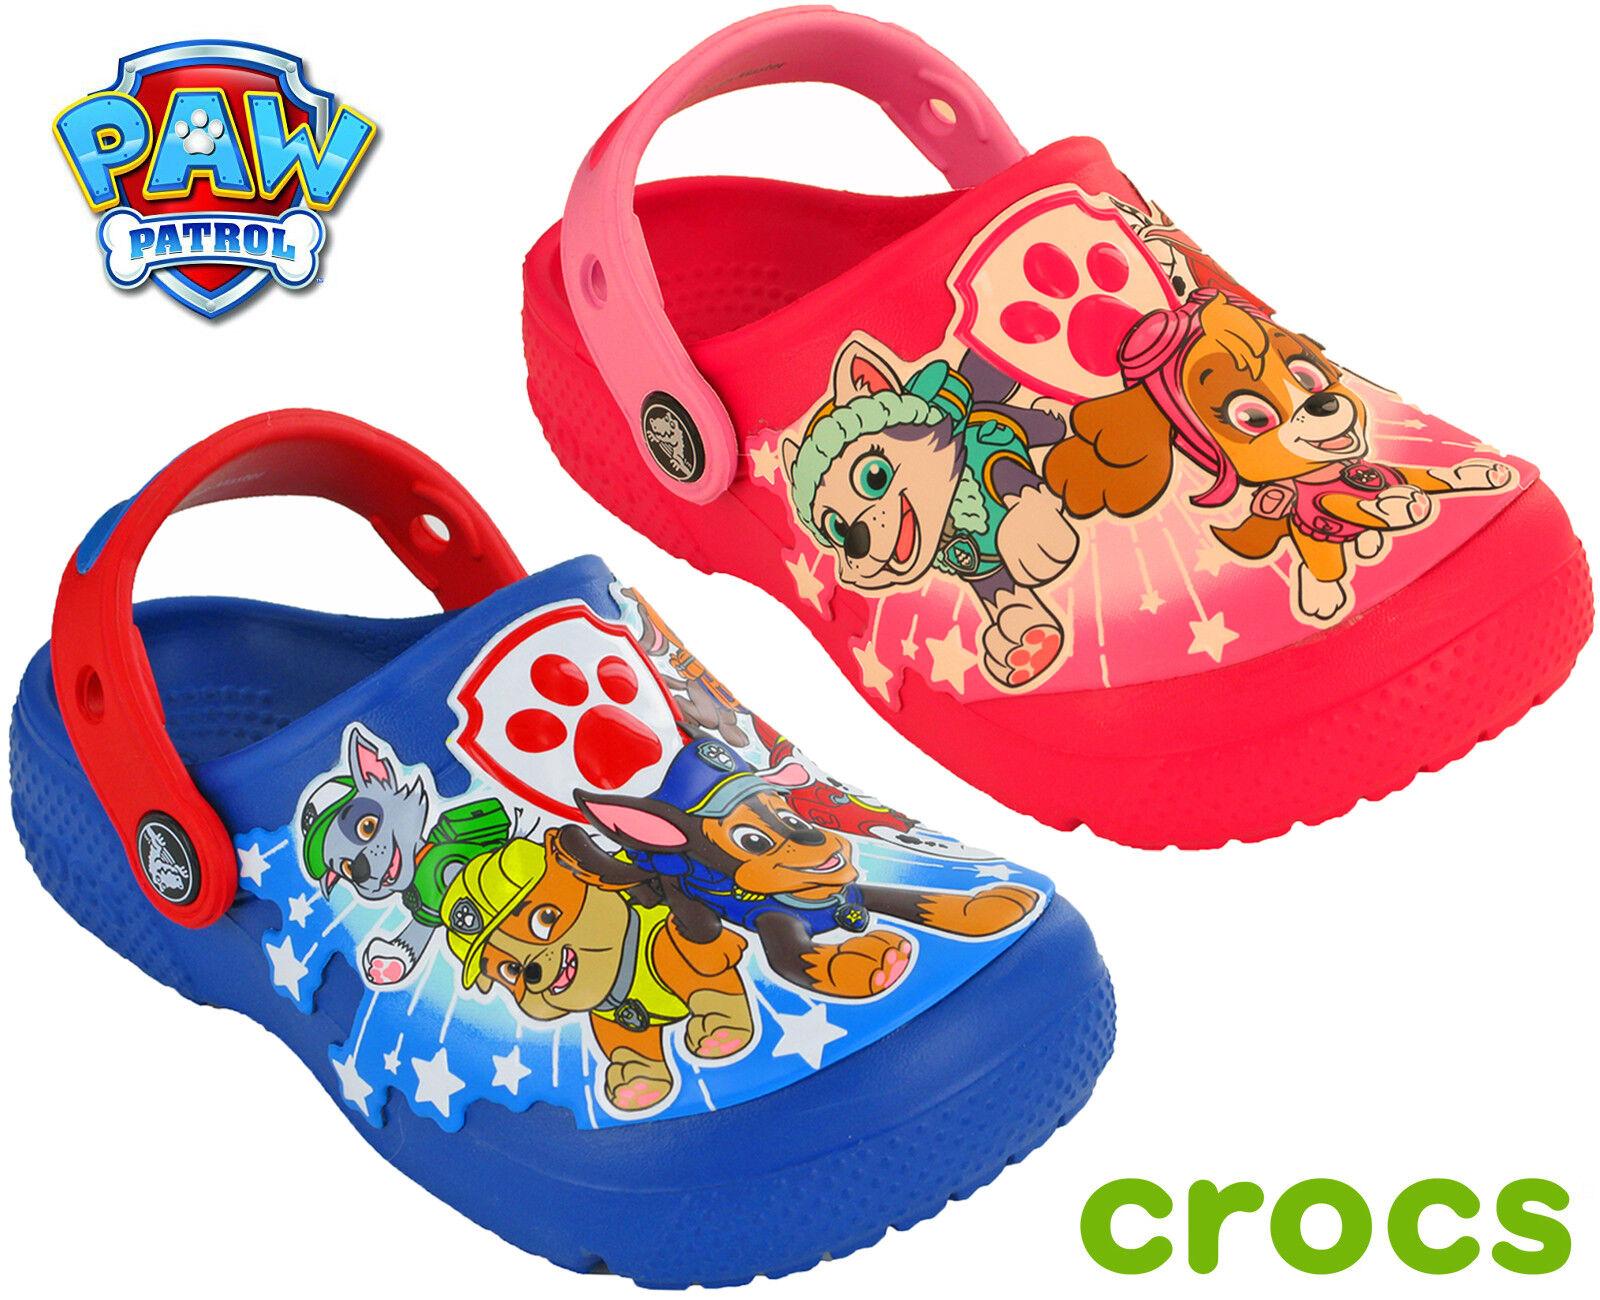 Crocs Paw Patrol Kids Clogs 2018